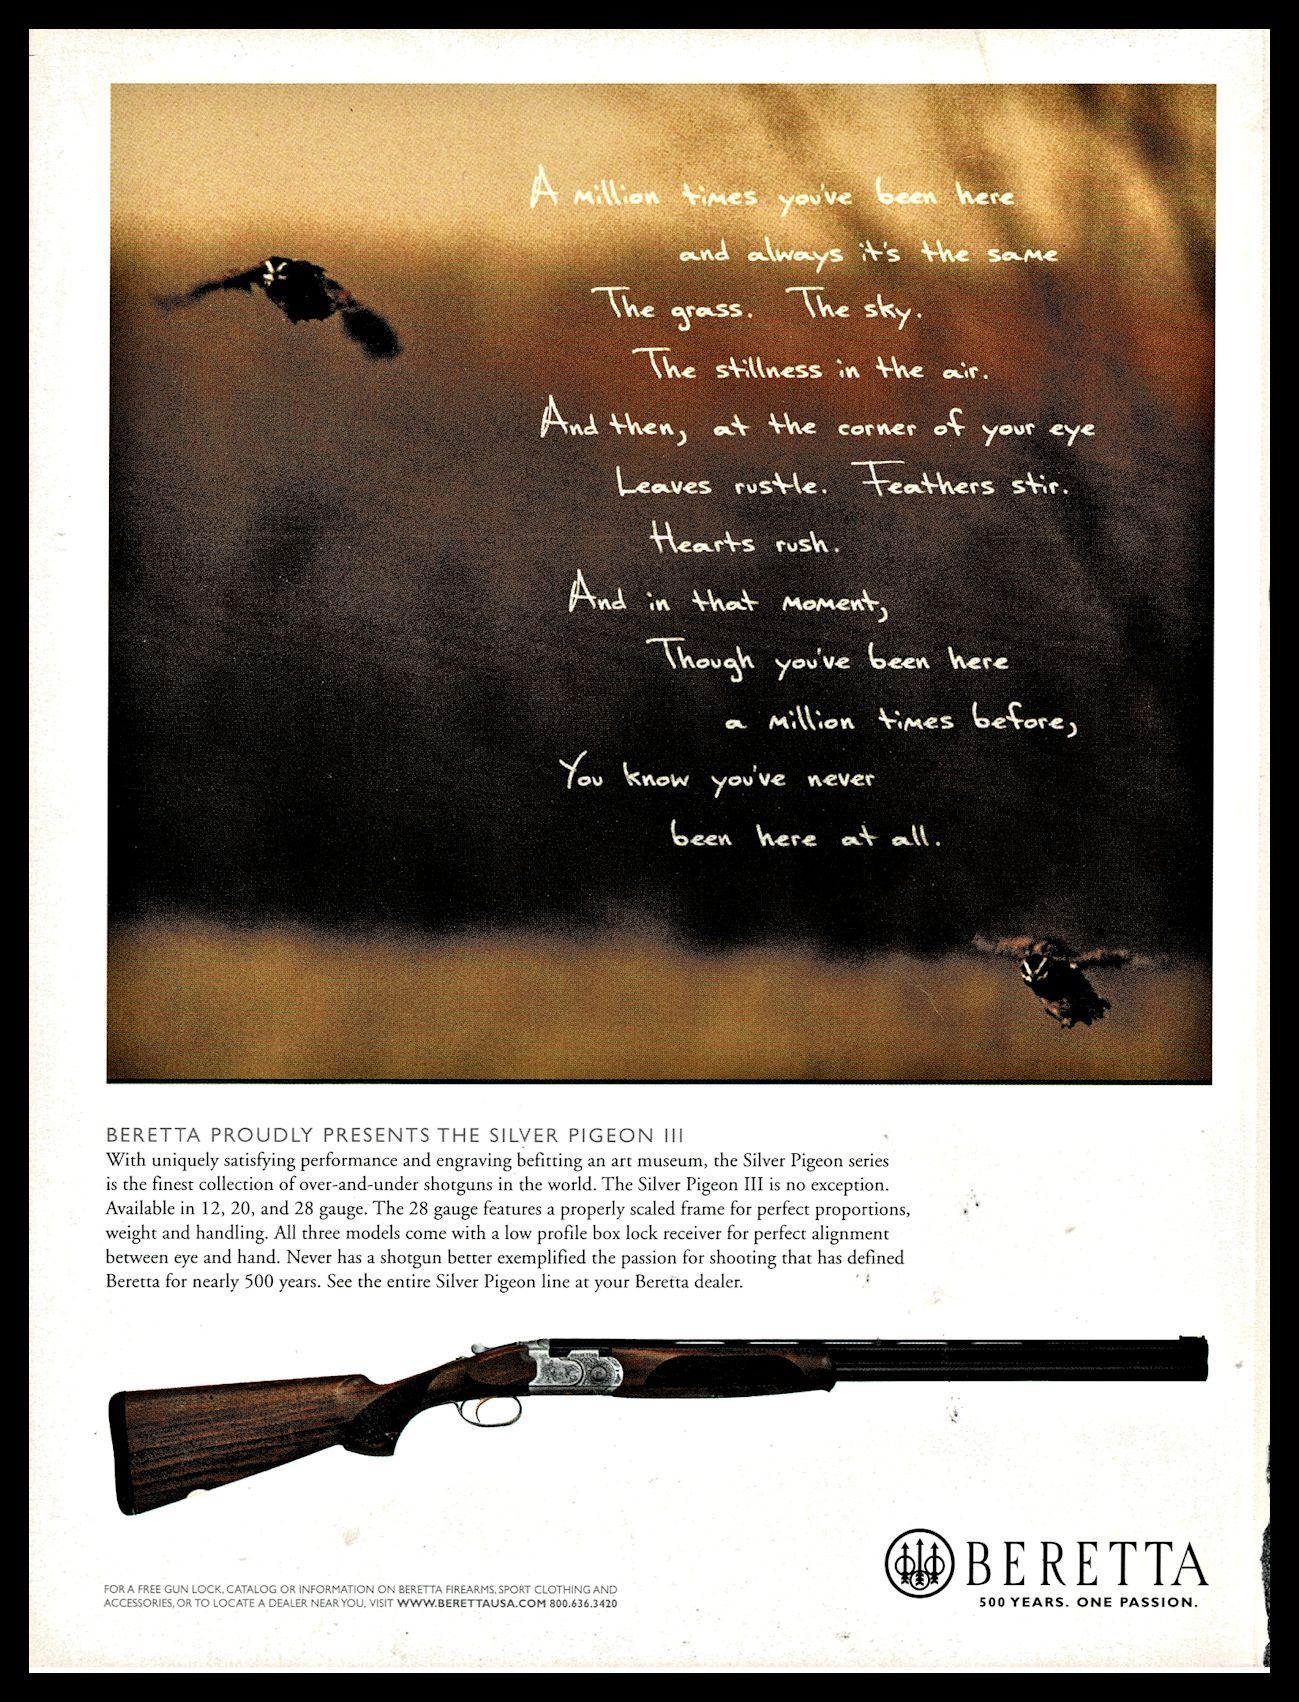 vn1904 Beretta Dealer Arm Gun Shop for Advertising Display Banner Sign